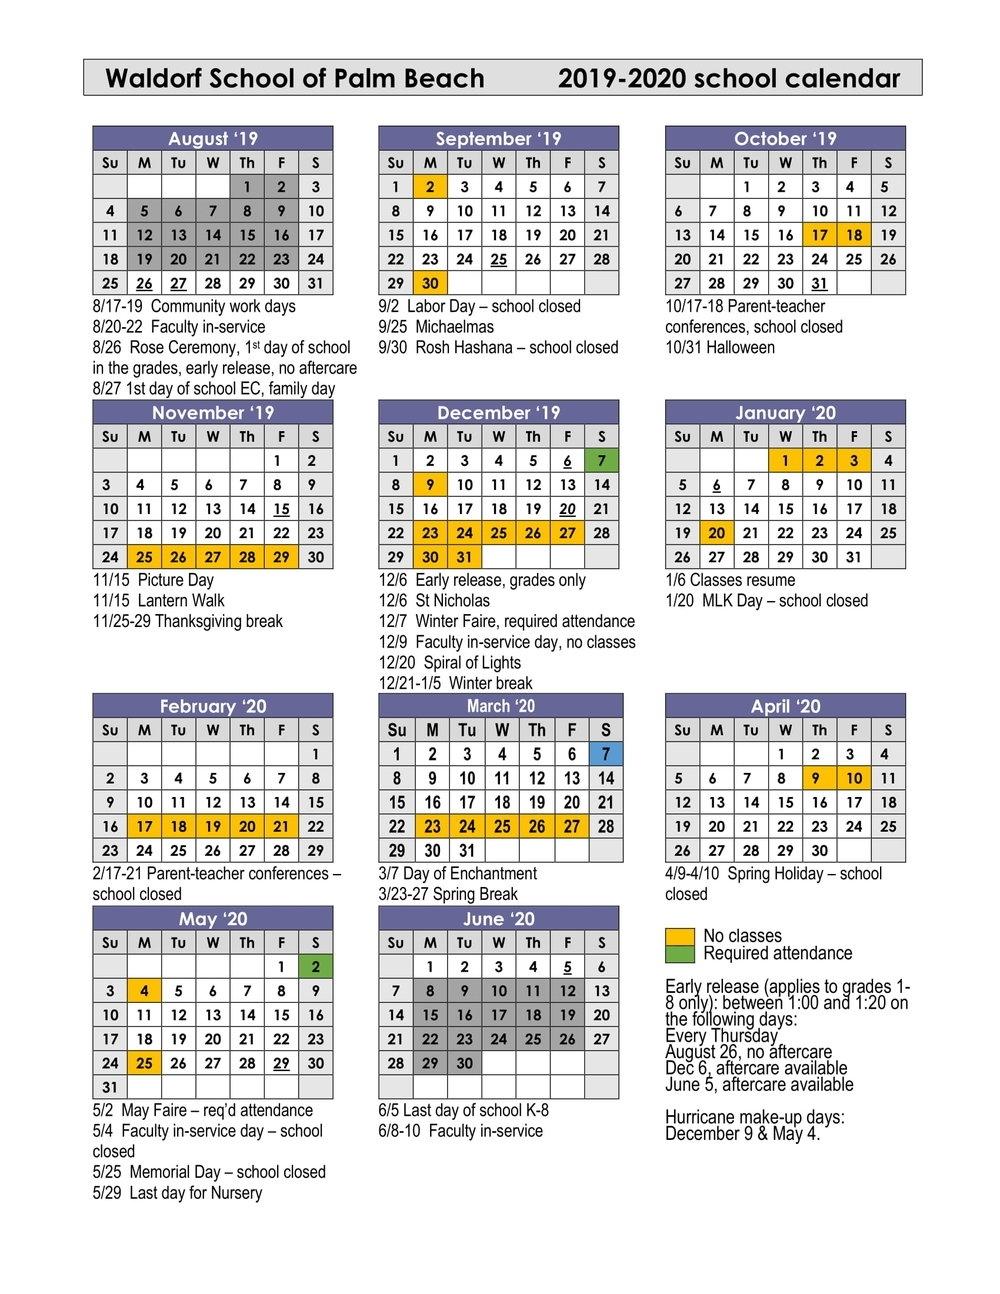 First Day Of School Grades 2019-2020 School Year — Waldorf